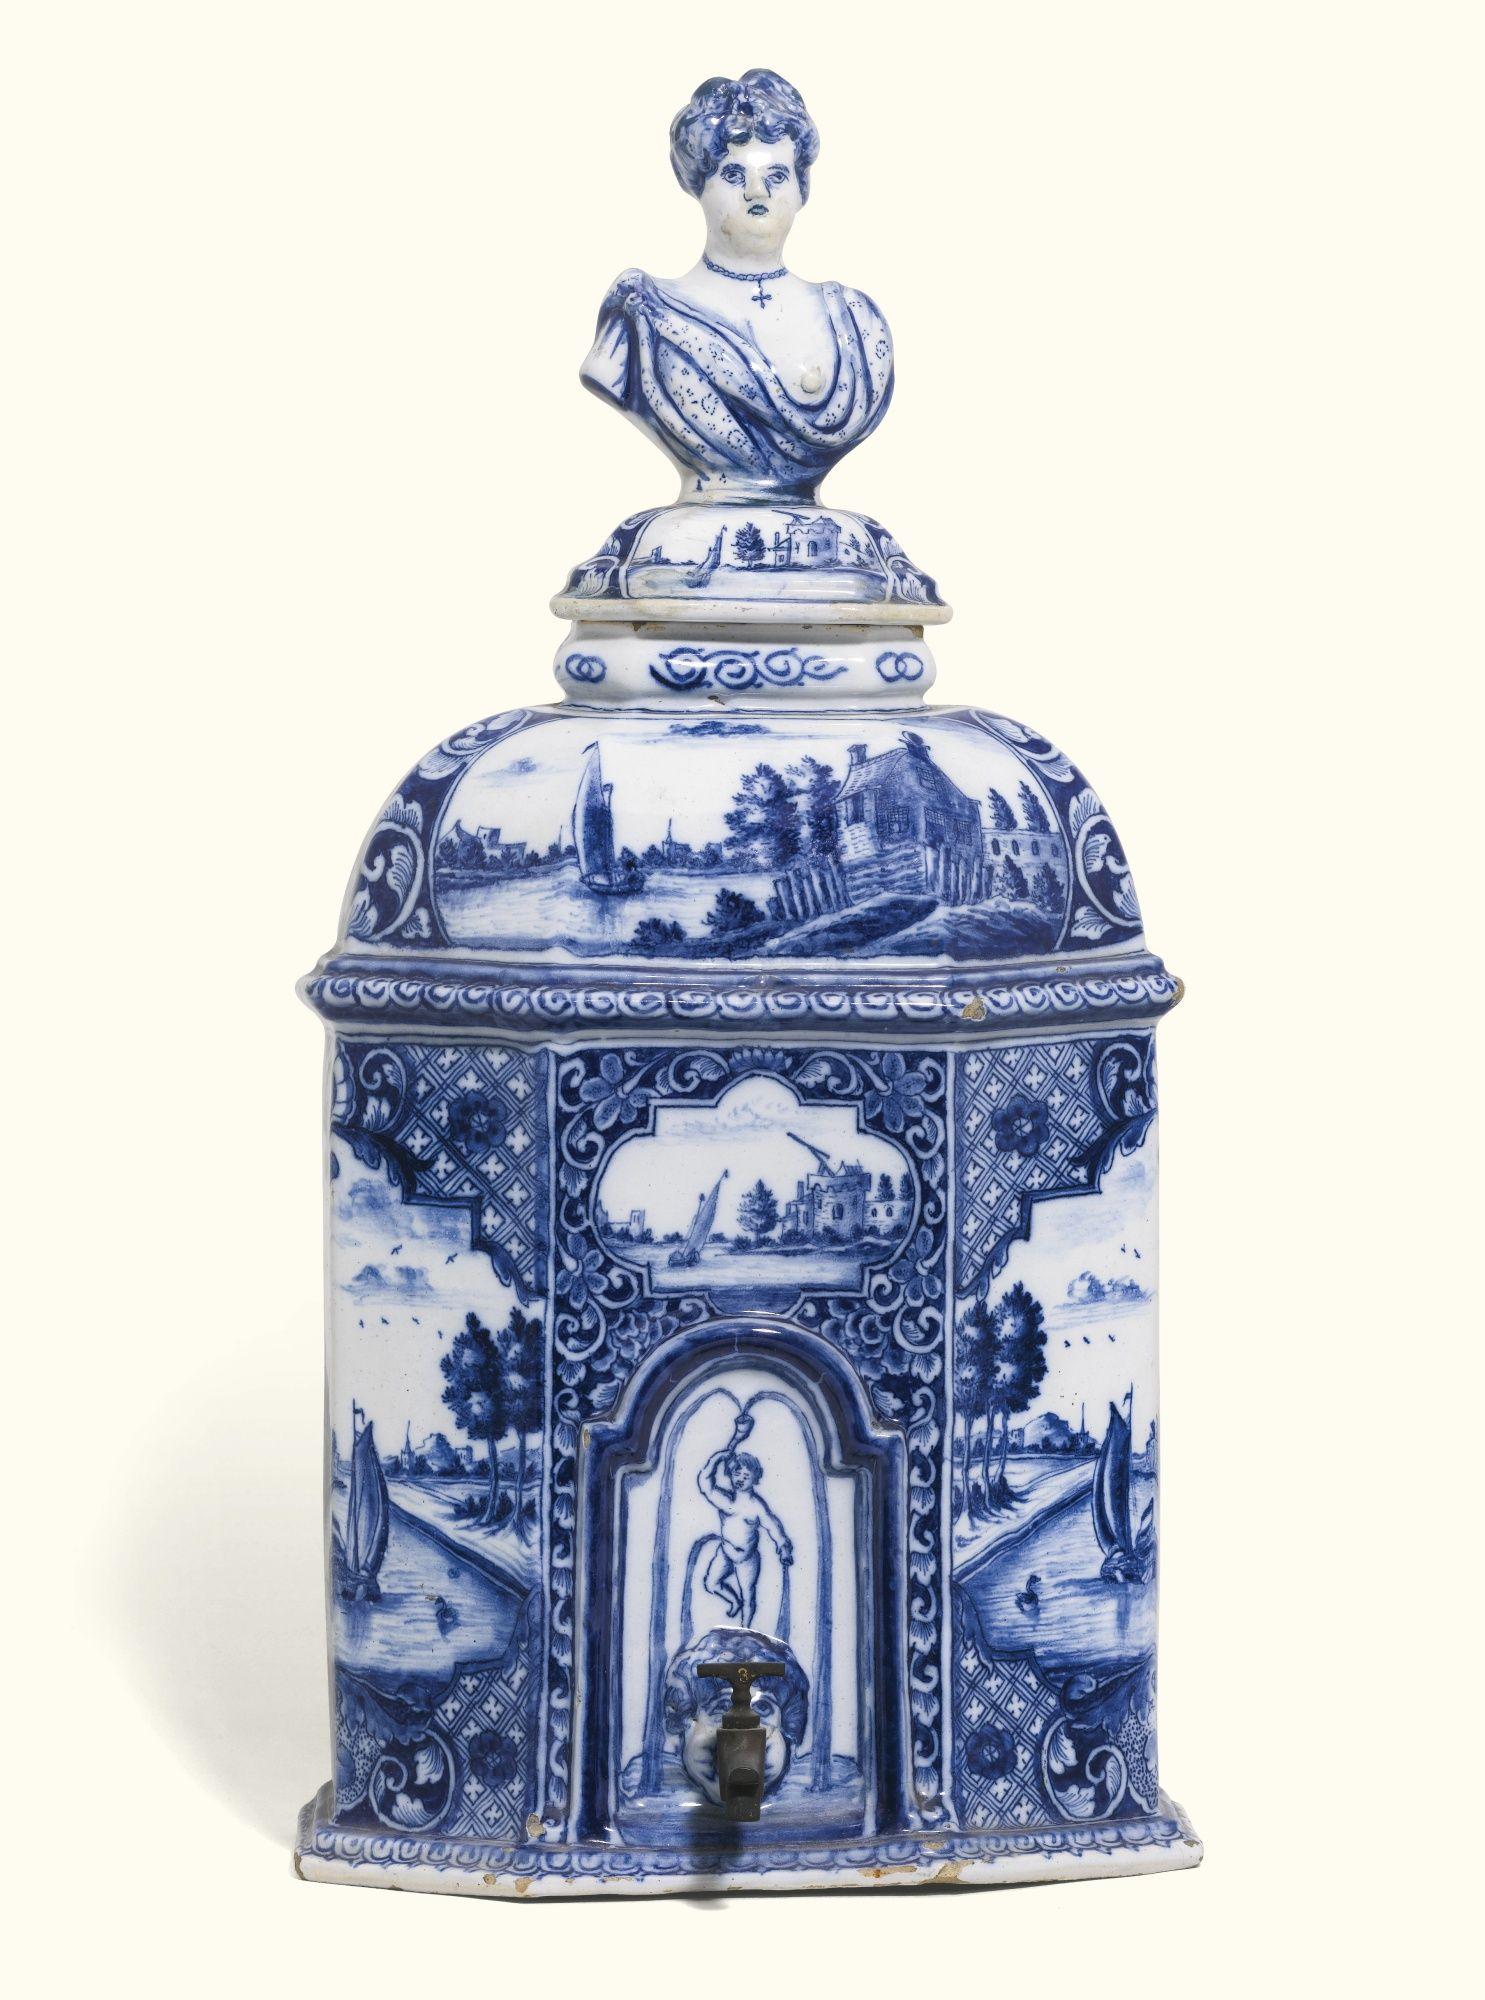 A rare Dutch Delft blue and white ater cistern and cover, circa 1750-1760